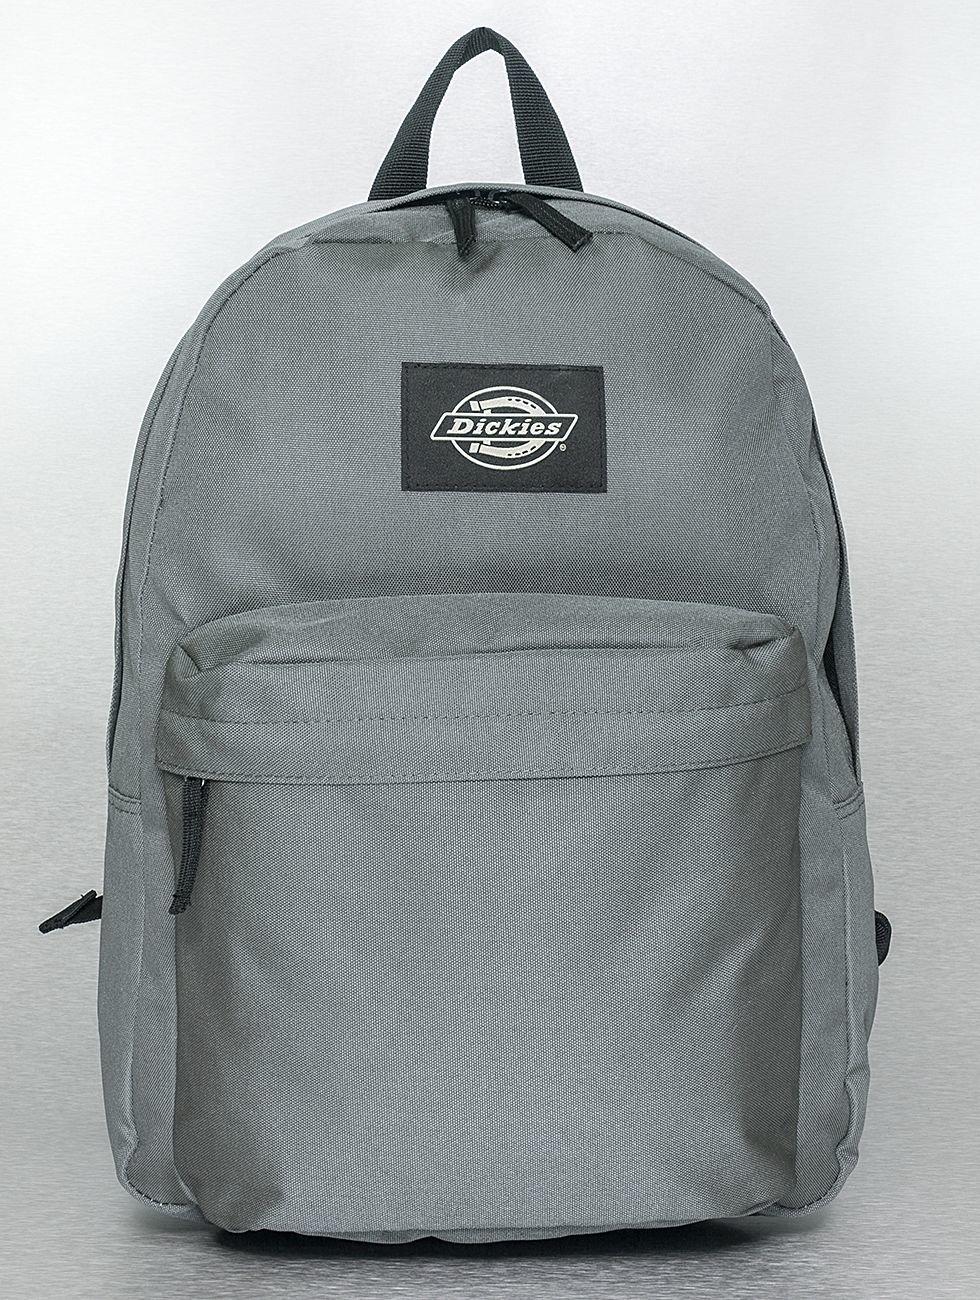 Dickies Backpack Indianapolis gray